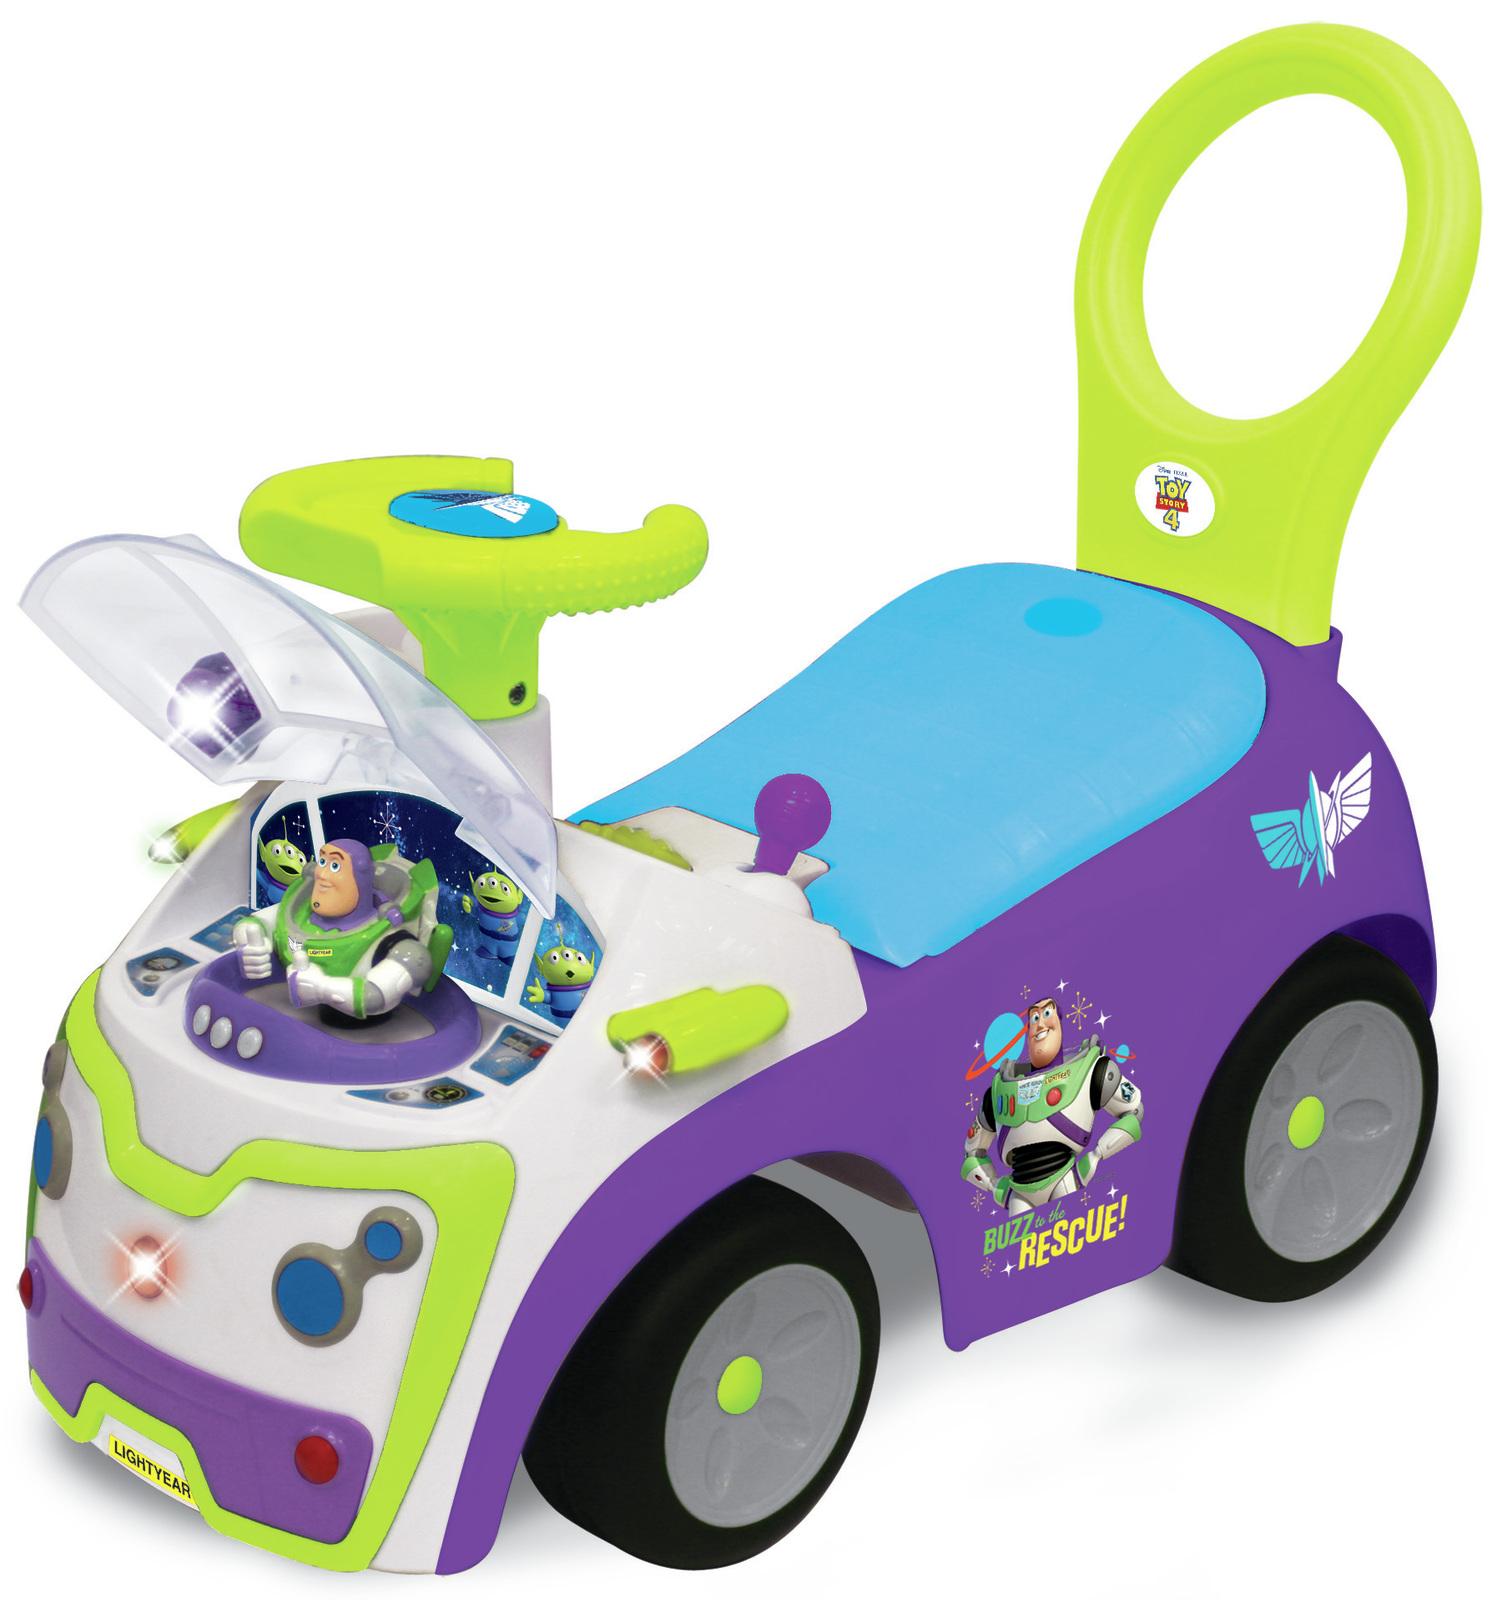 Kiddieland: Activity Ride-On - Buzz Lightyear image